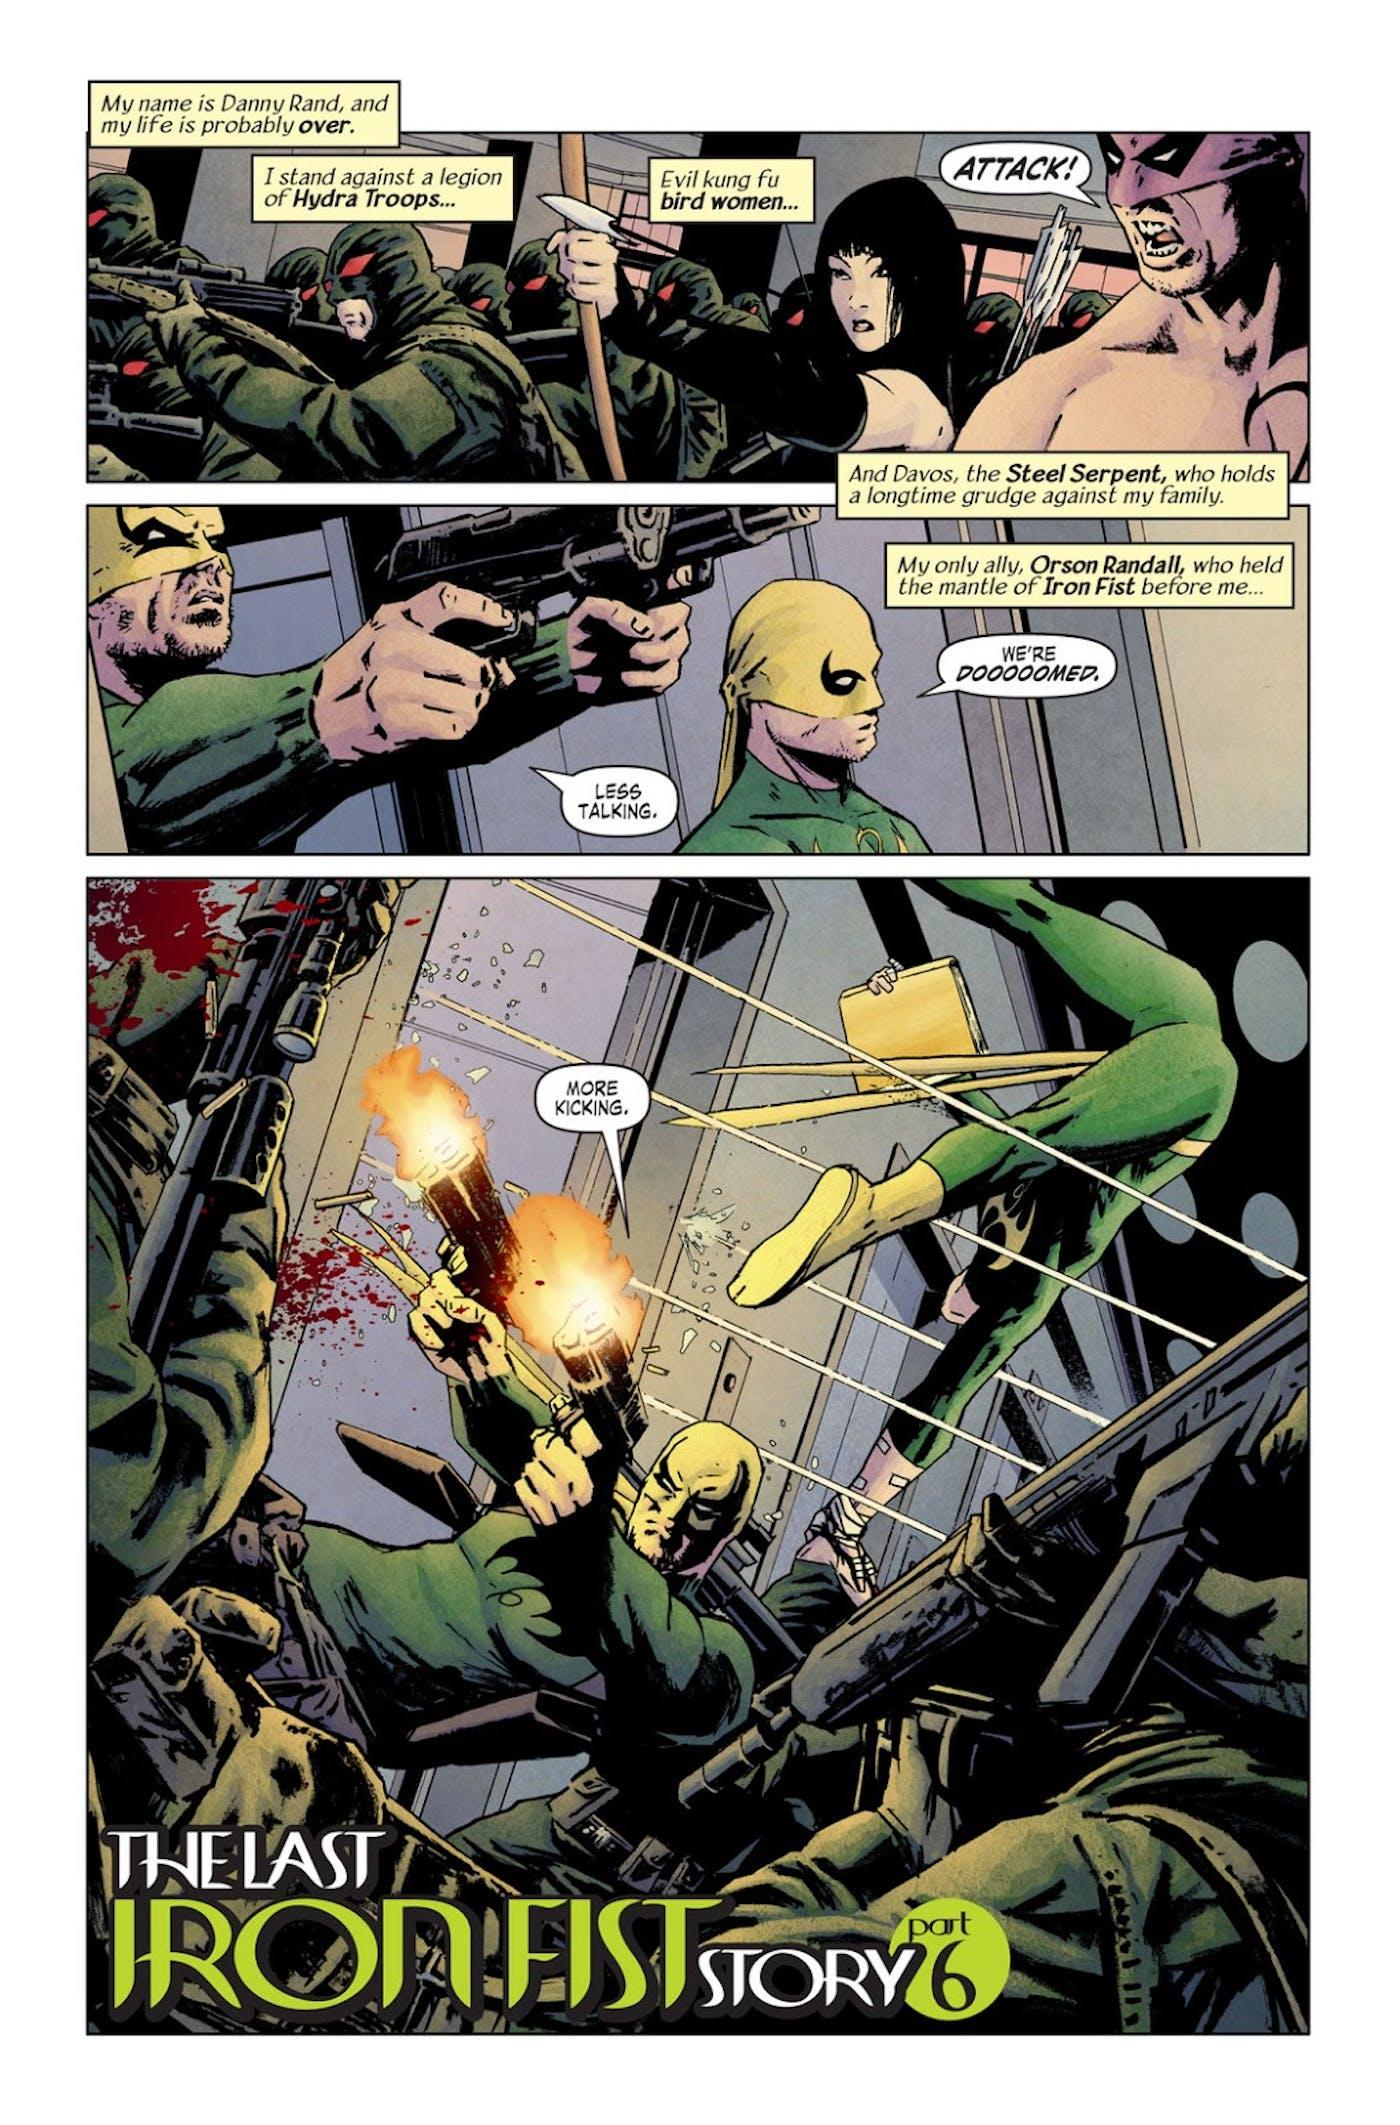 Iron Fist' Season 2 Ending: Danny's Guns and Orson Randall